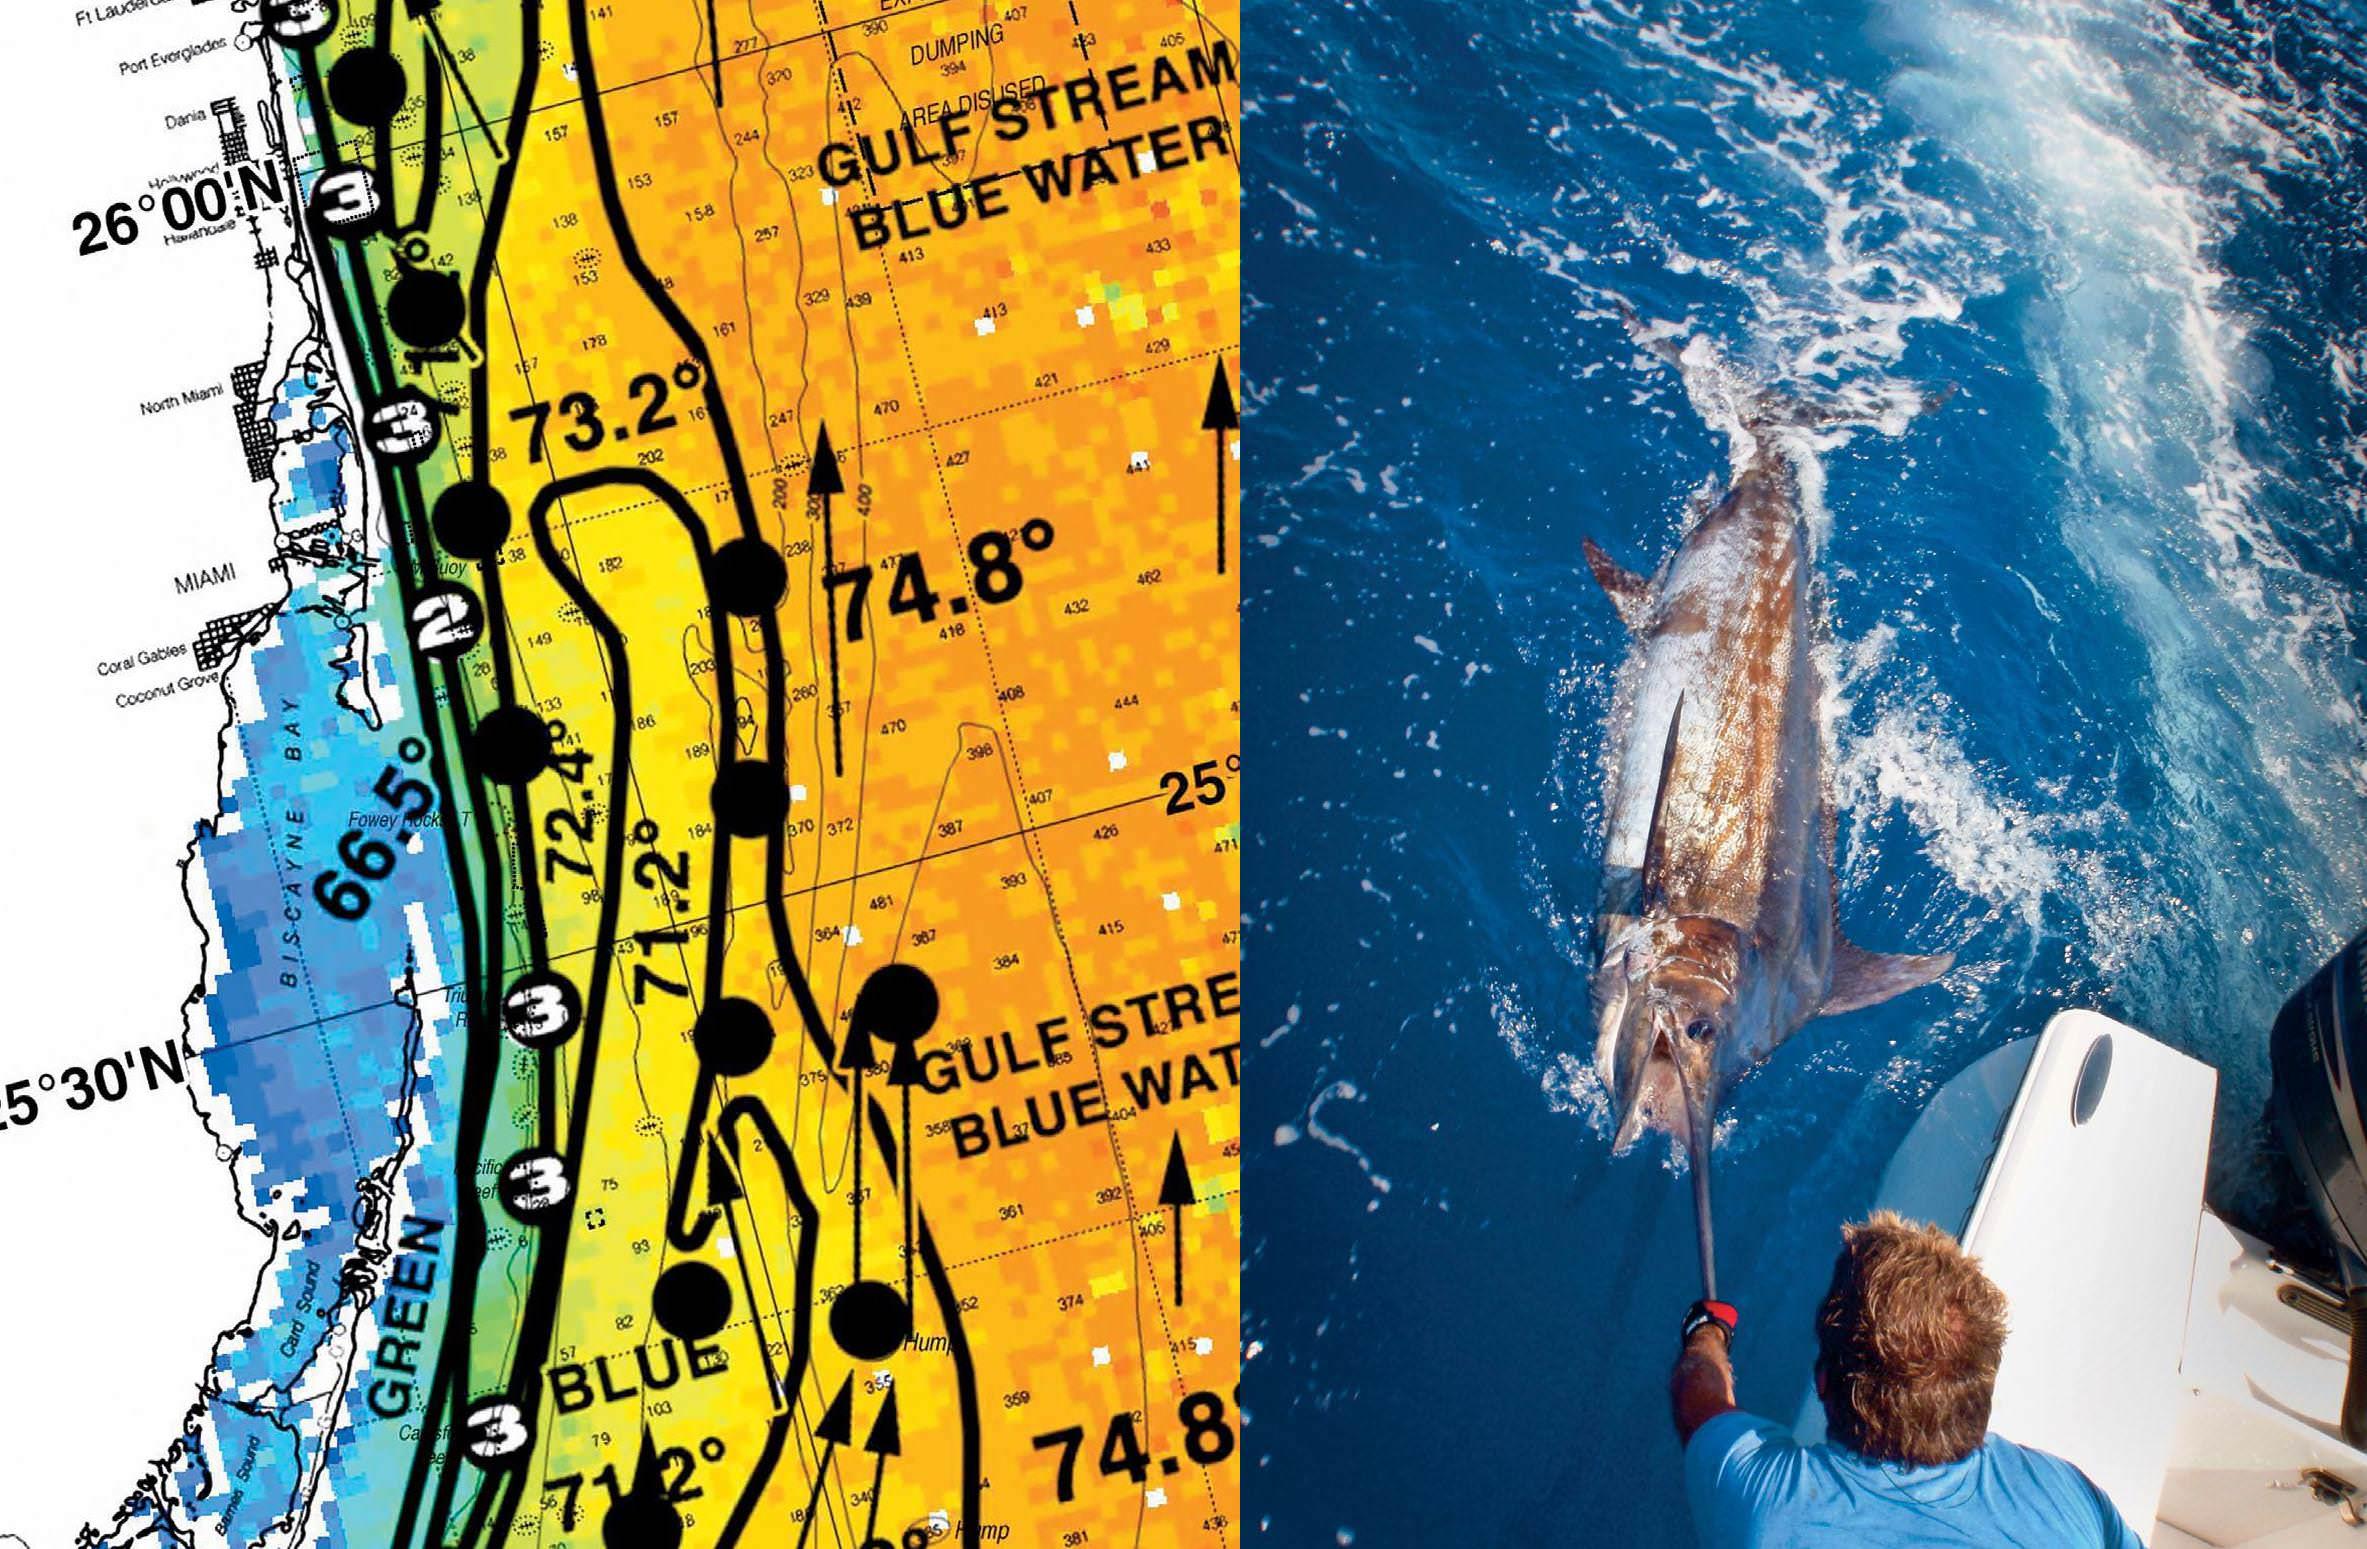 Marlin metrics for Florida sport fishing